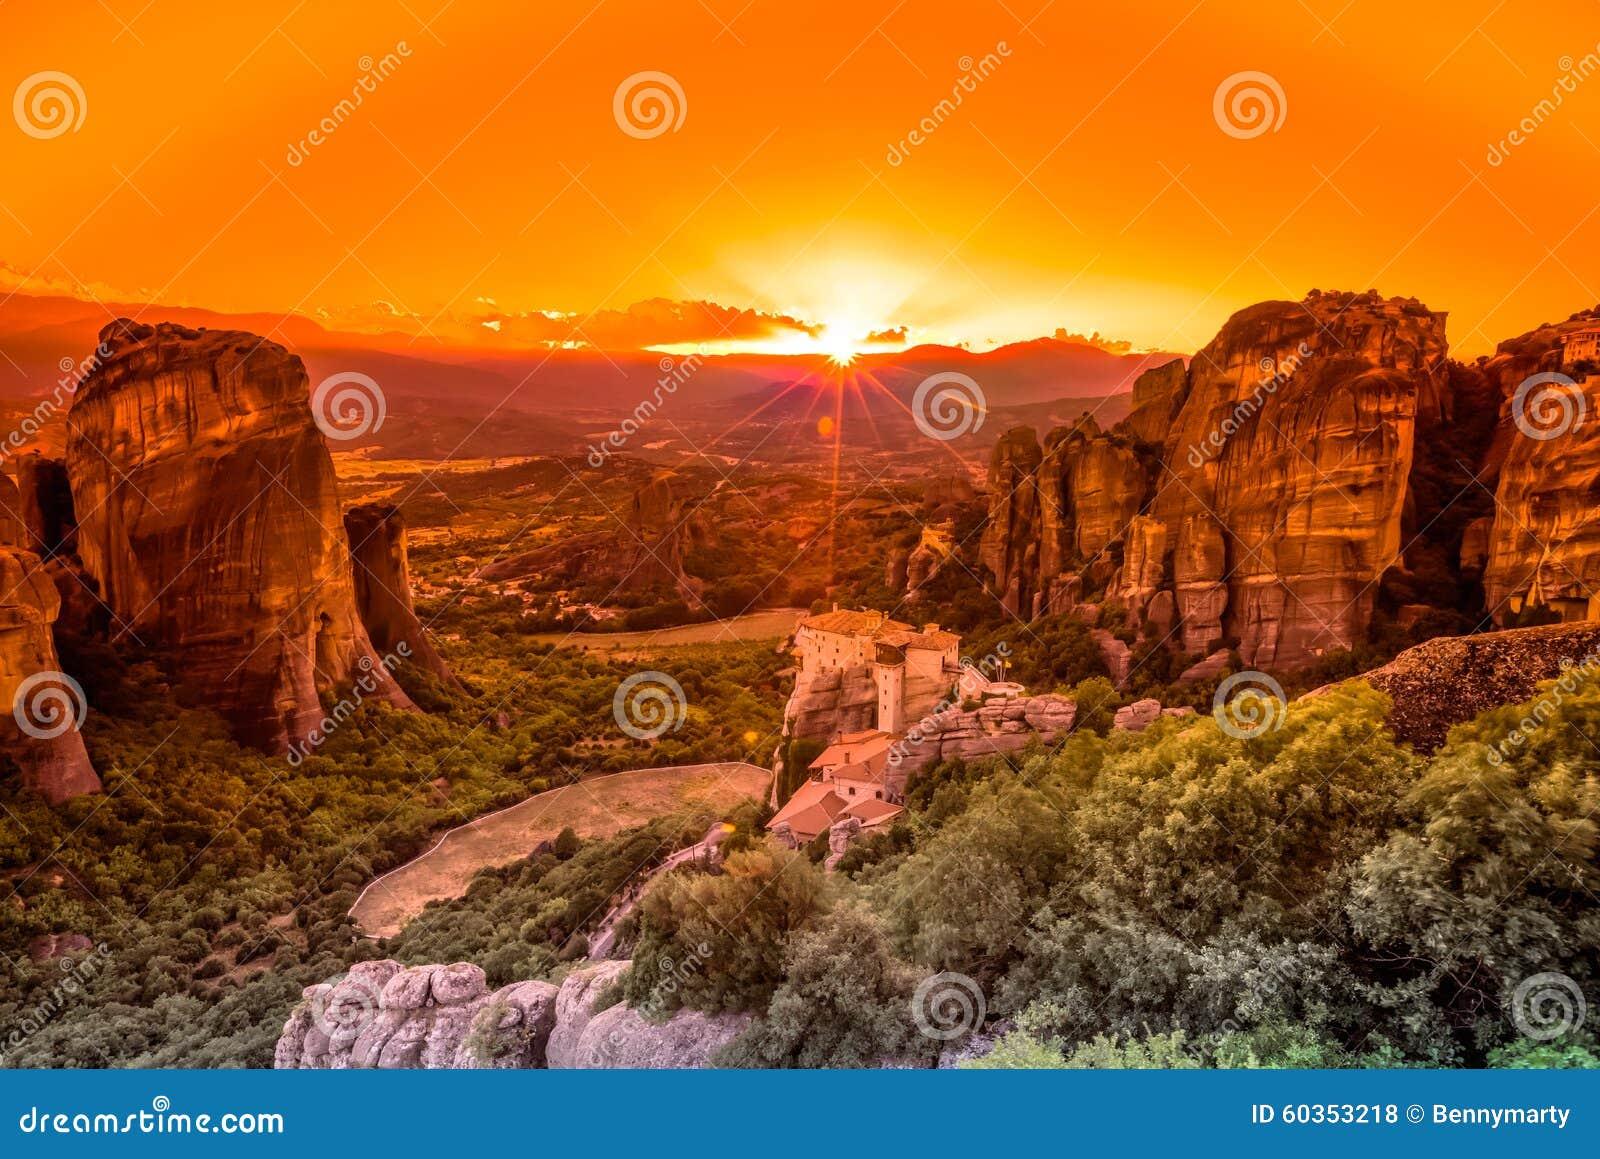 Spectacular sunset in Meteora Monasteries